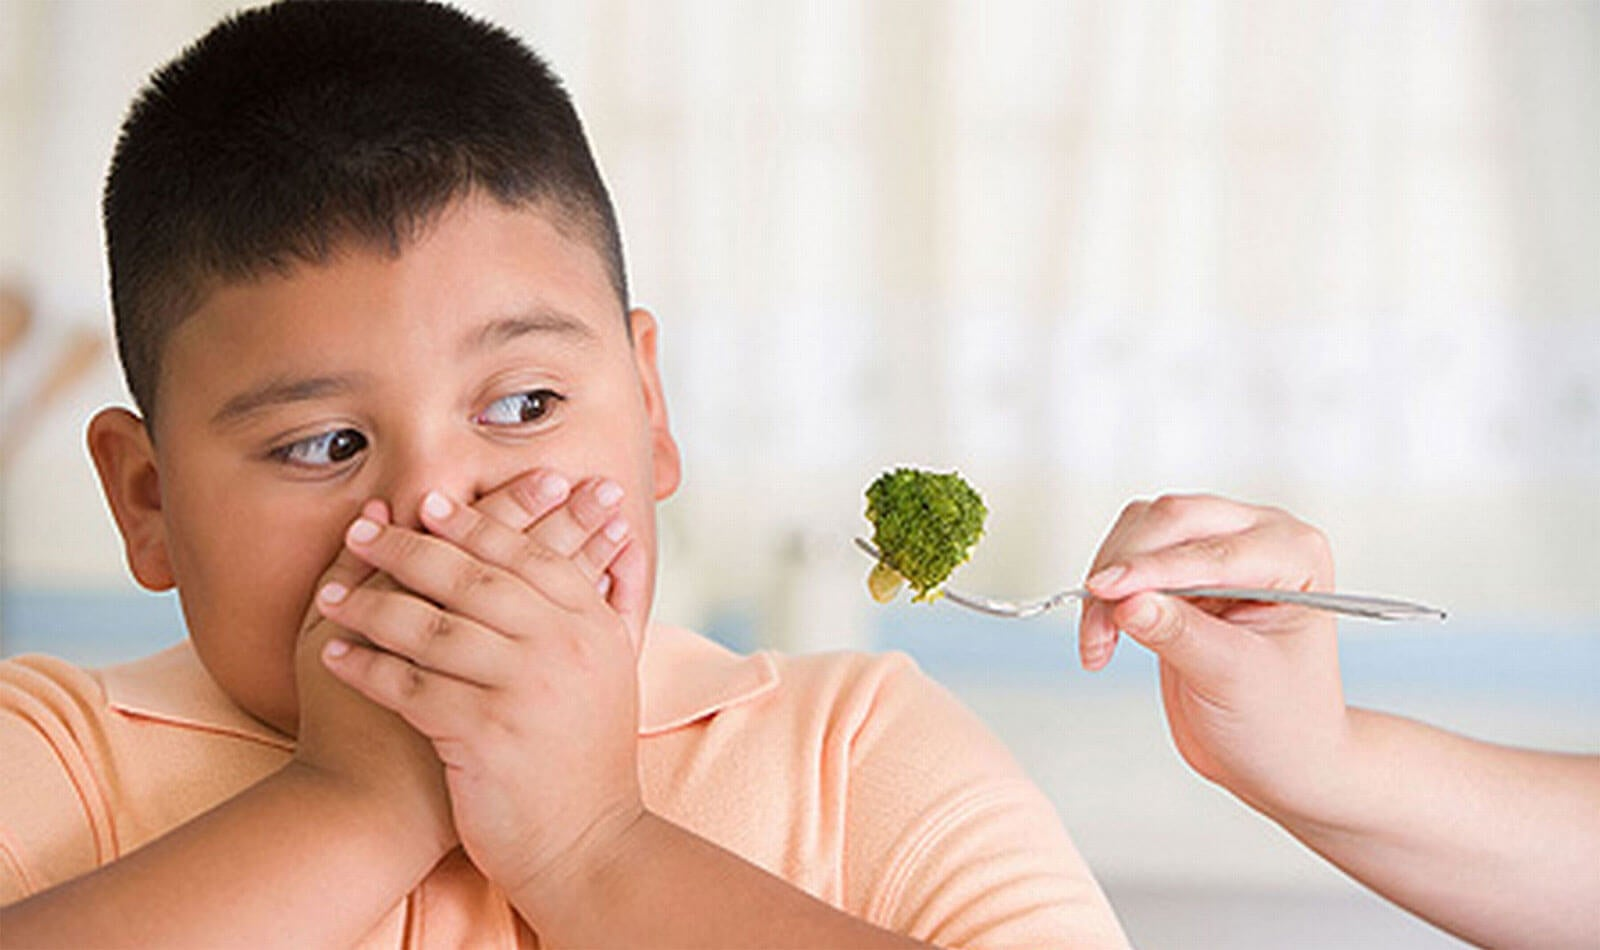 Niño obeso rechazando brócoli